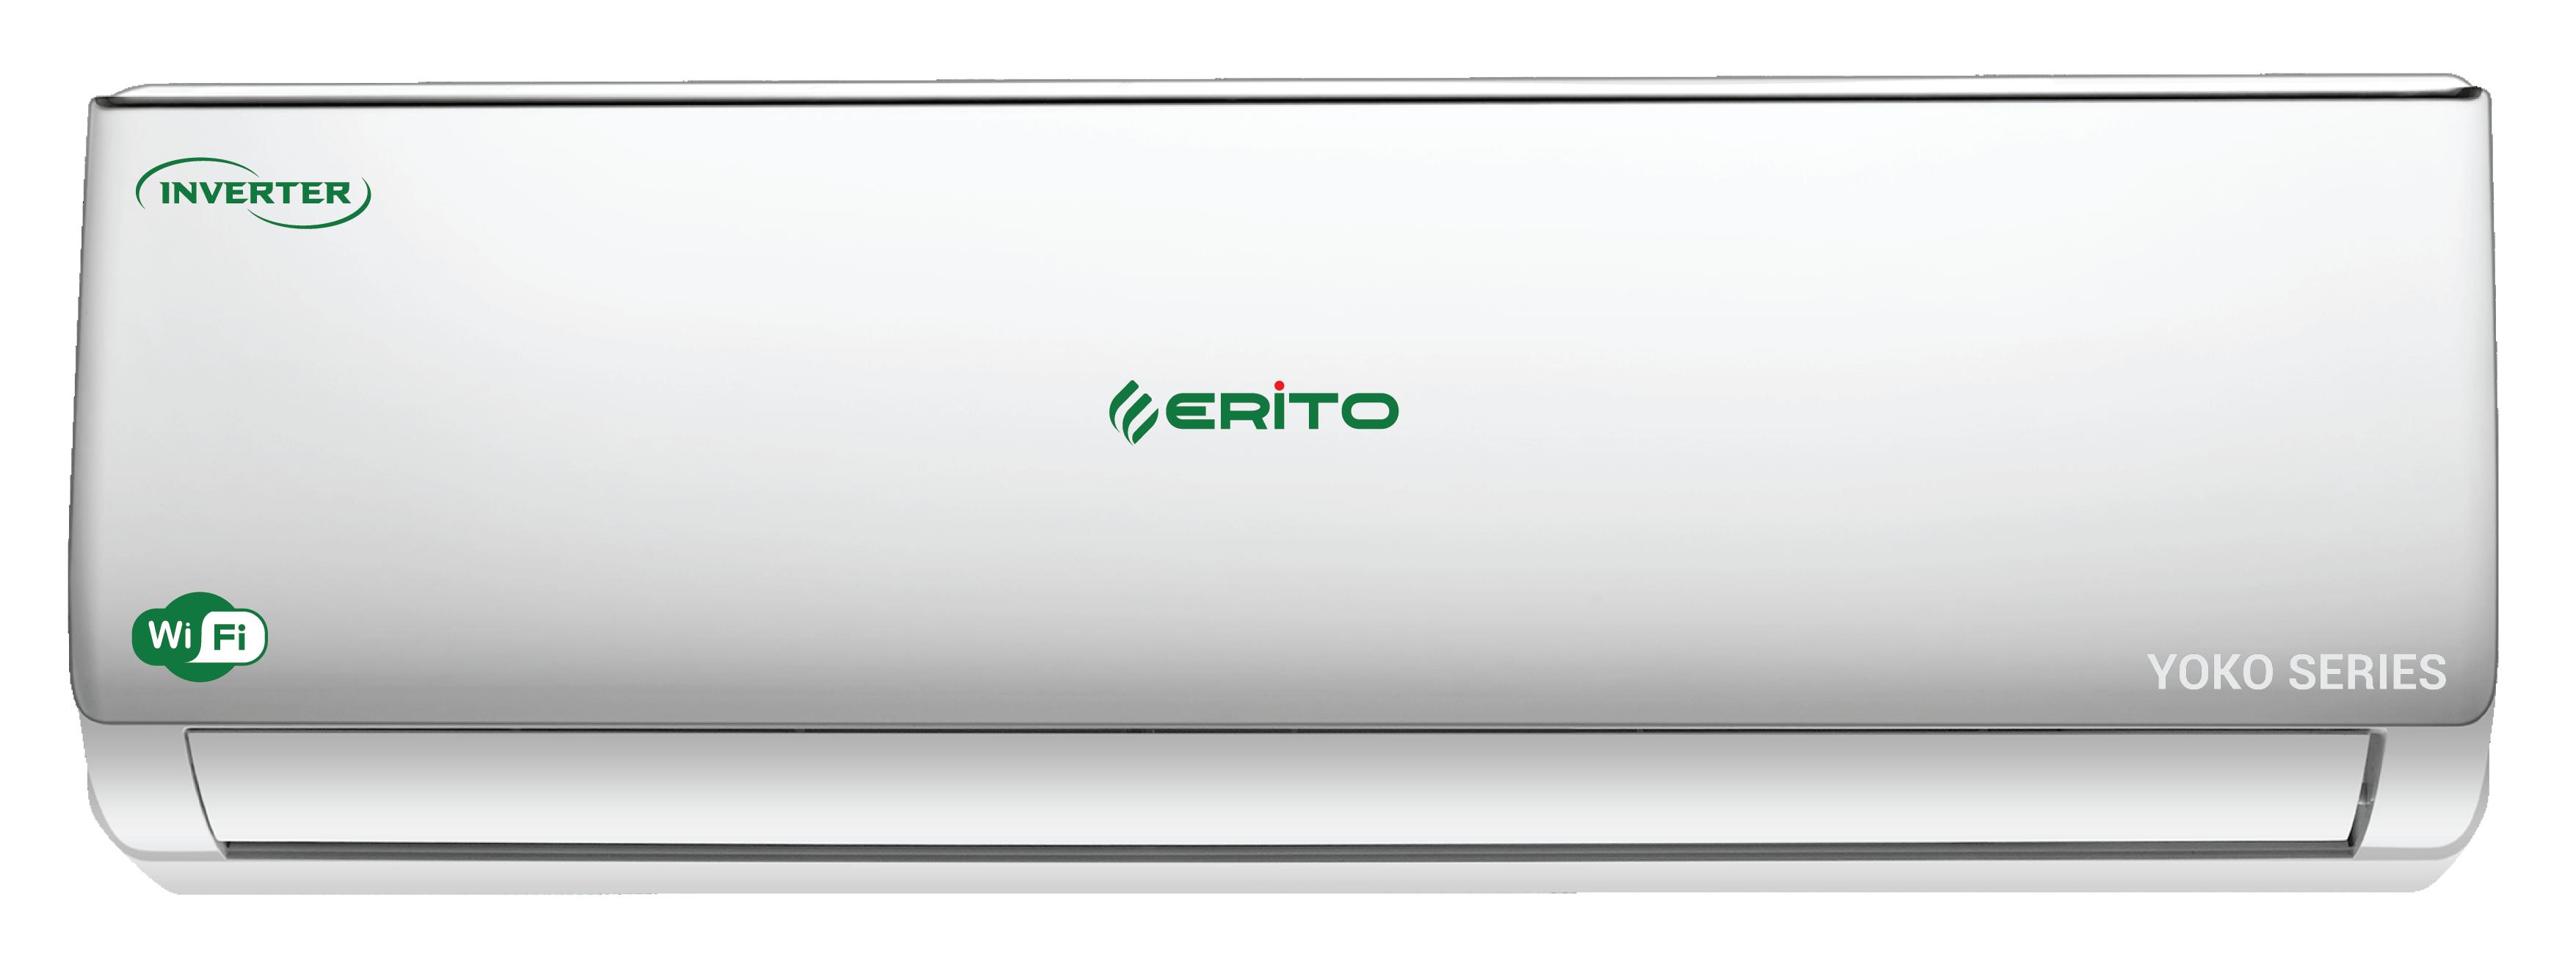 Điều hòa Yoko Series 24000BTU inverter hai chiều